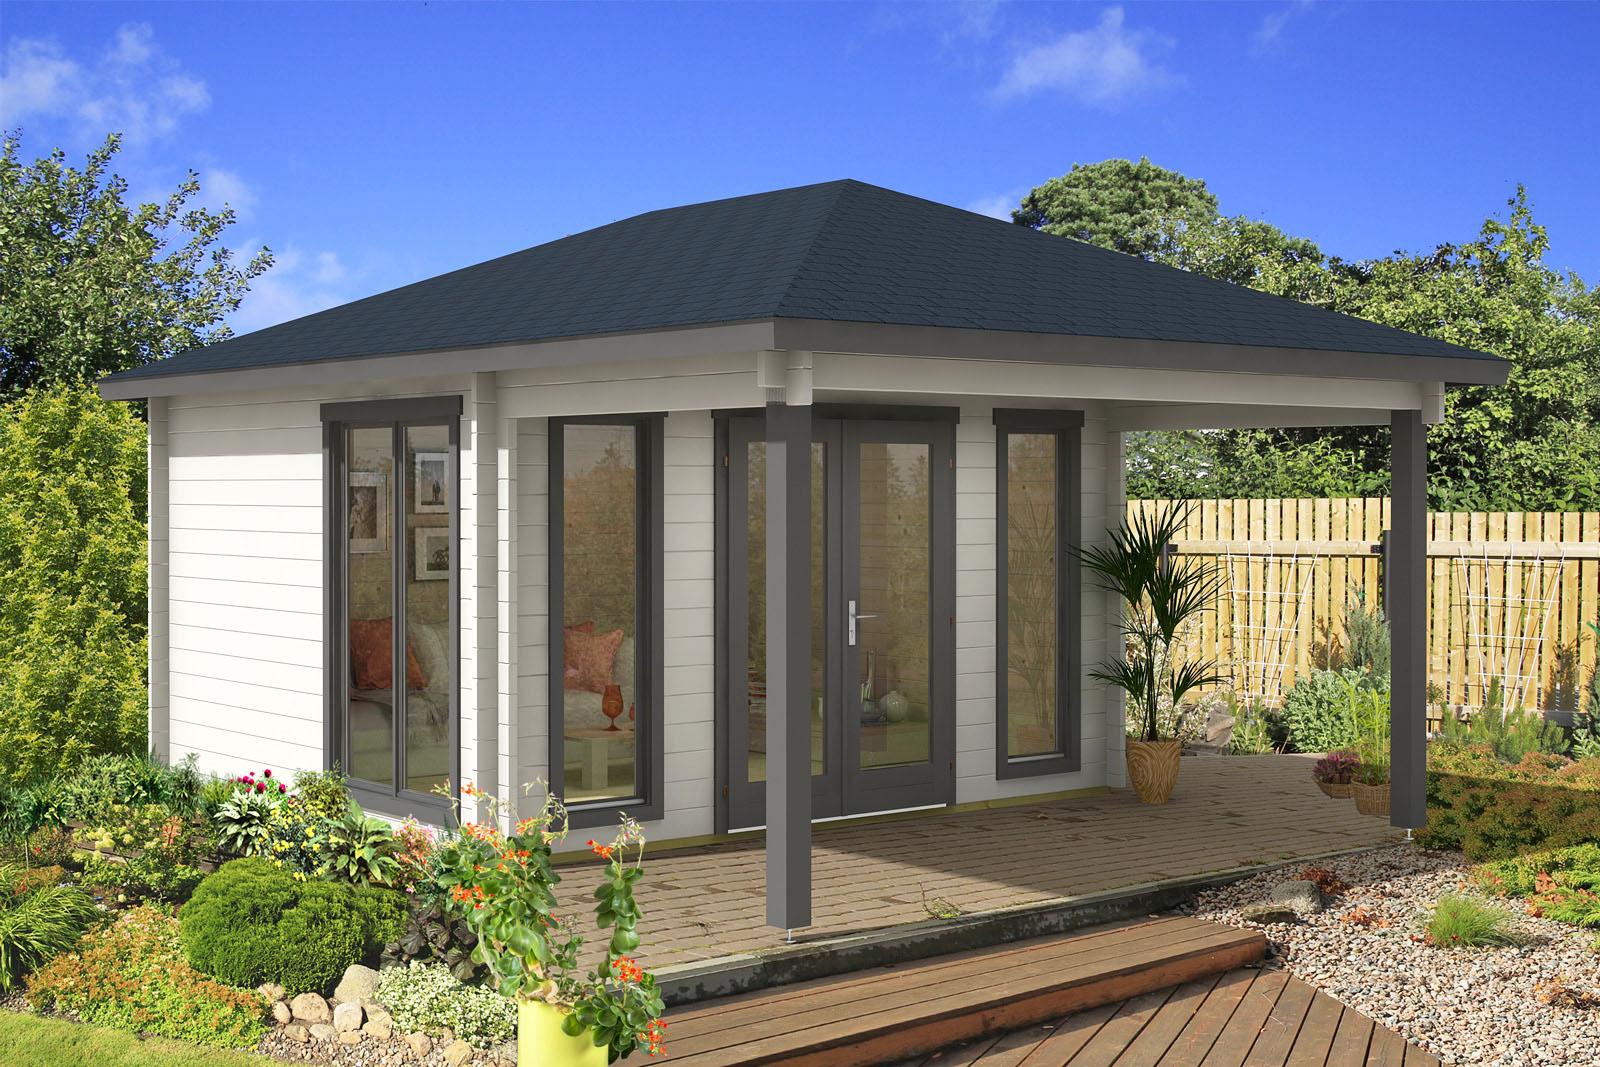 Gartenhaus modell madrid 44 - Sauna premium madrid opiniones ...